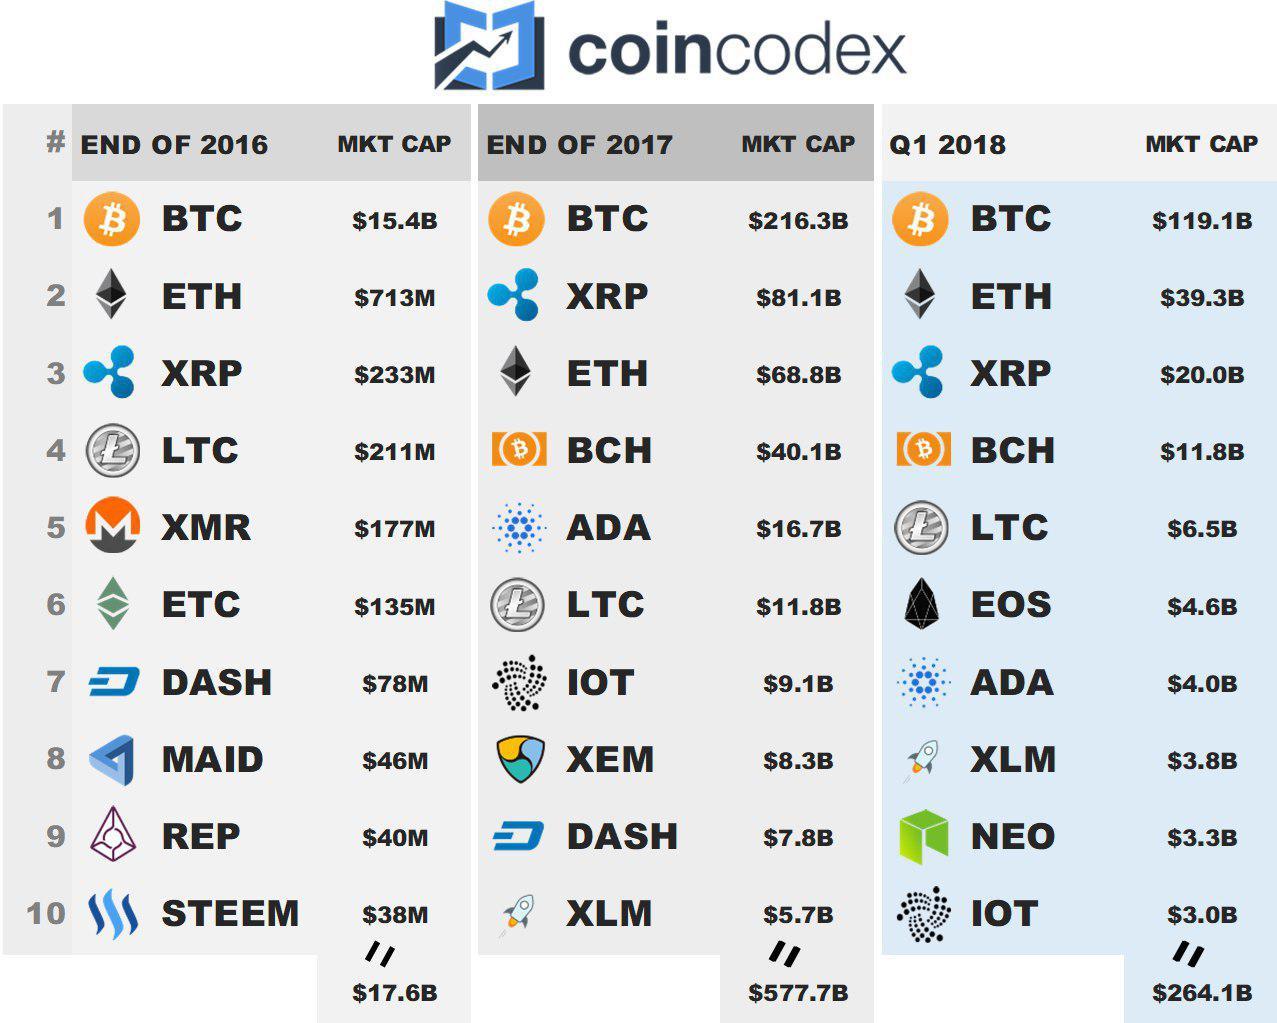 Coincodex - Cypto Marketcaps 2016 - Q1 2018